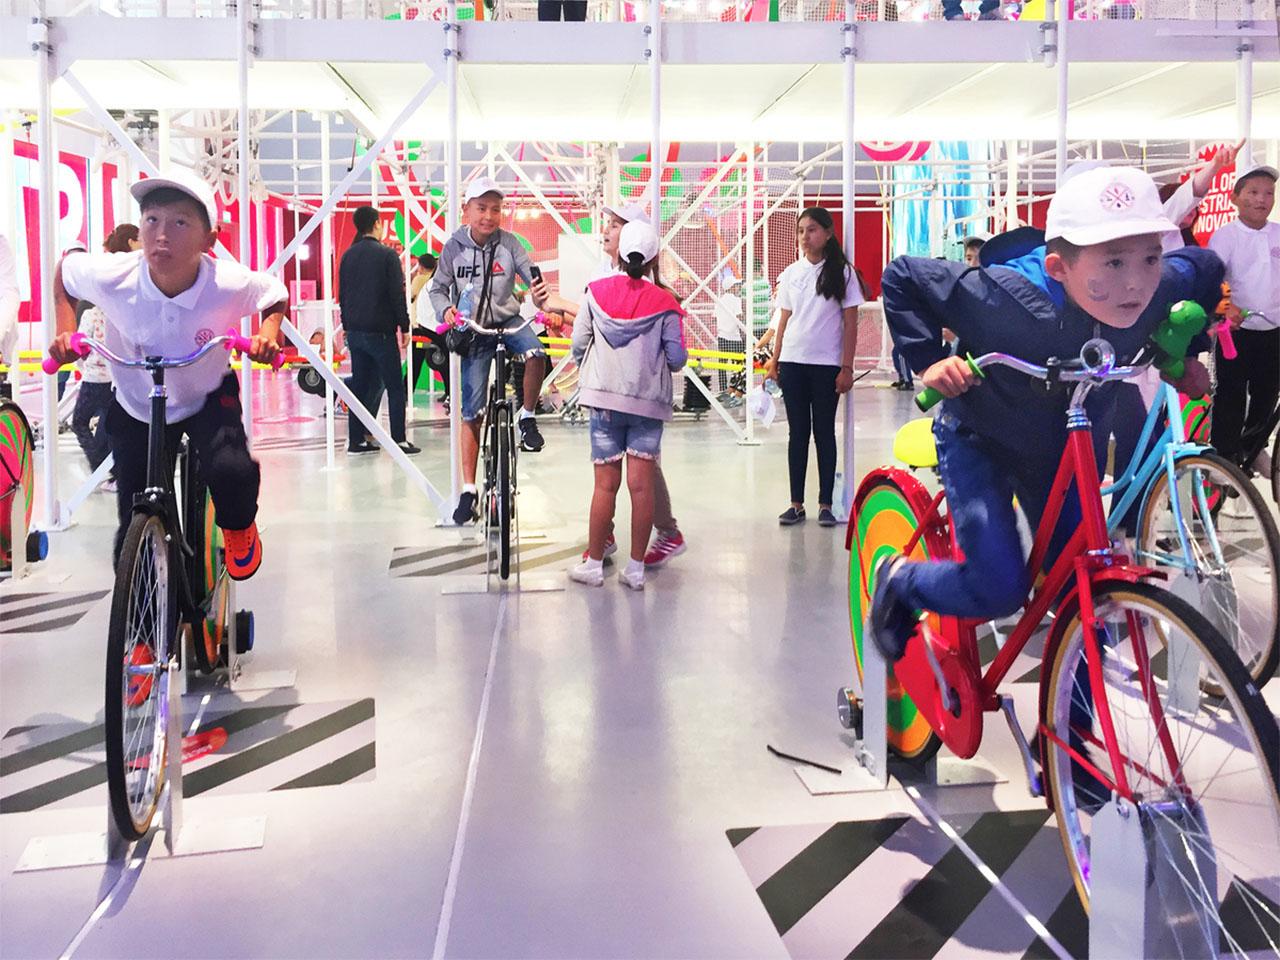 Austria Power Machine. Interactive installations 2017. Austrian EXPO 2017 pavilion, Astana, Kazakhstan. Photo: BWM Architekten